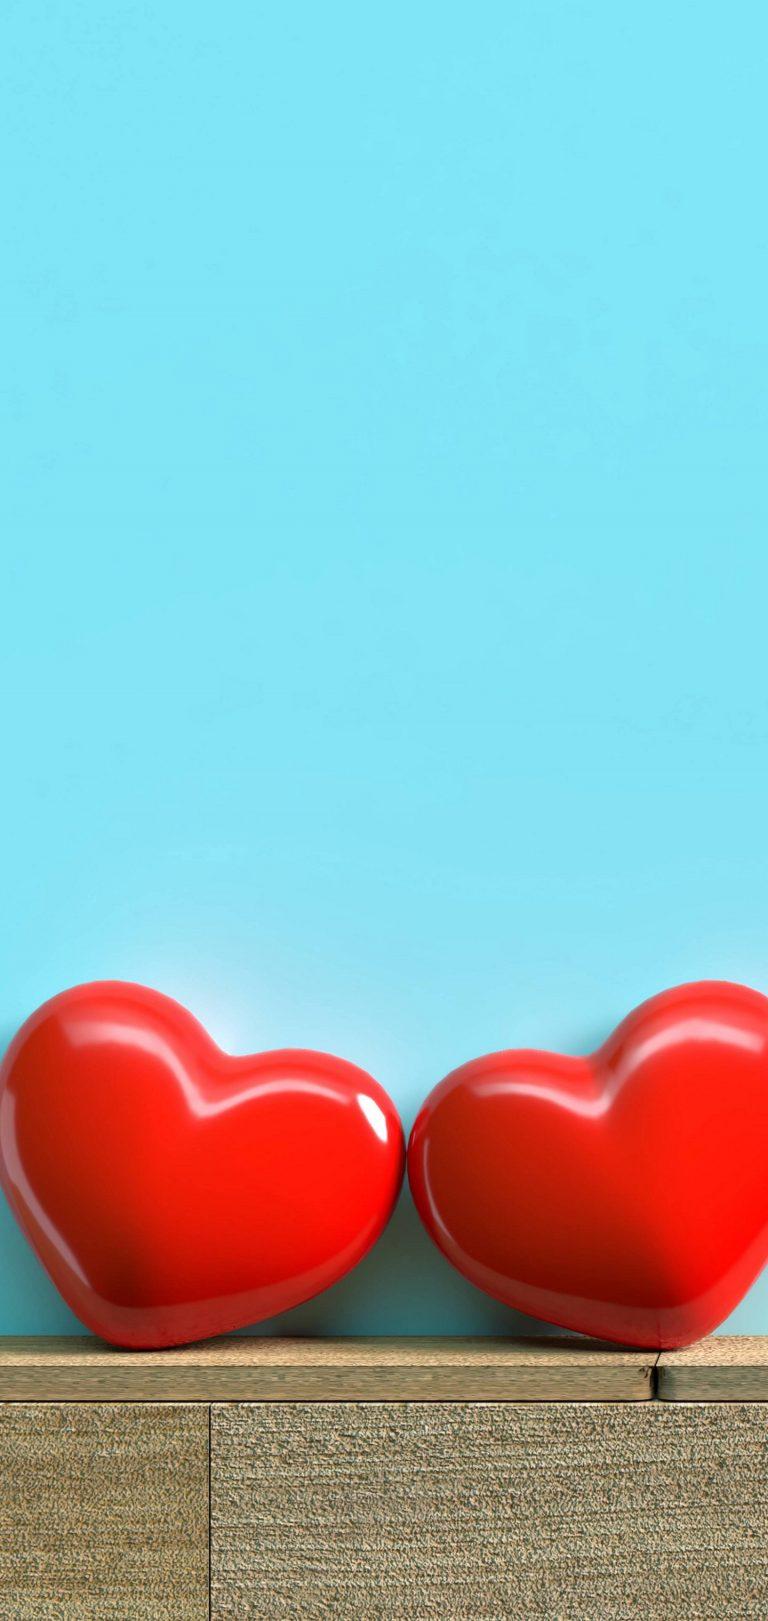 Red Hearts Love Wallpaper 1440x3040 768x1621